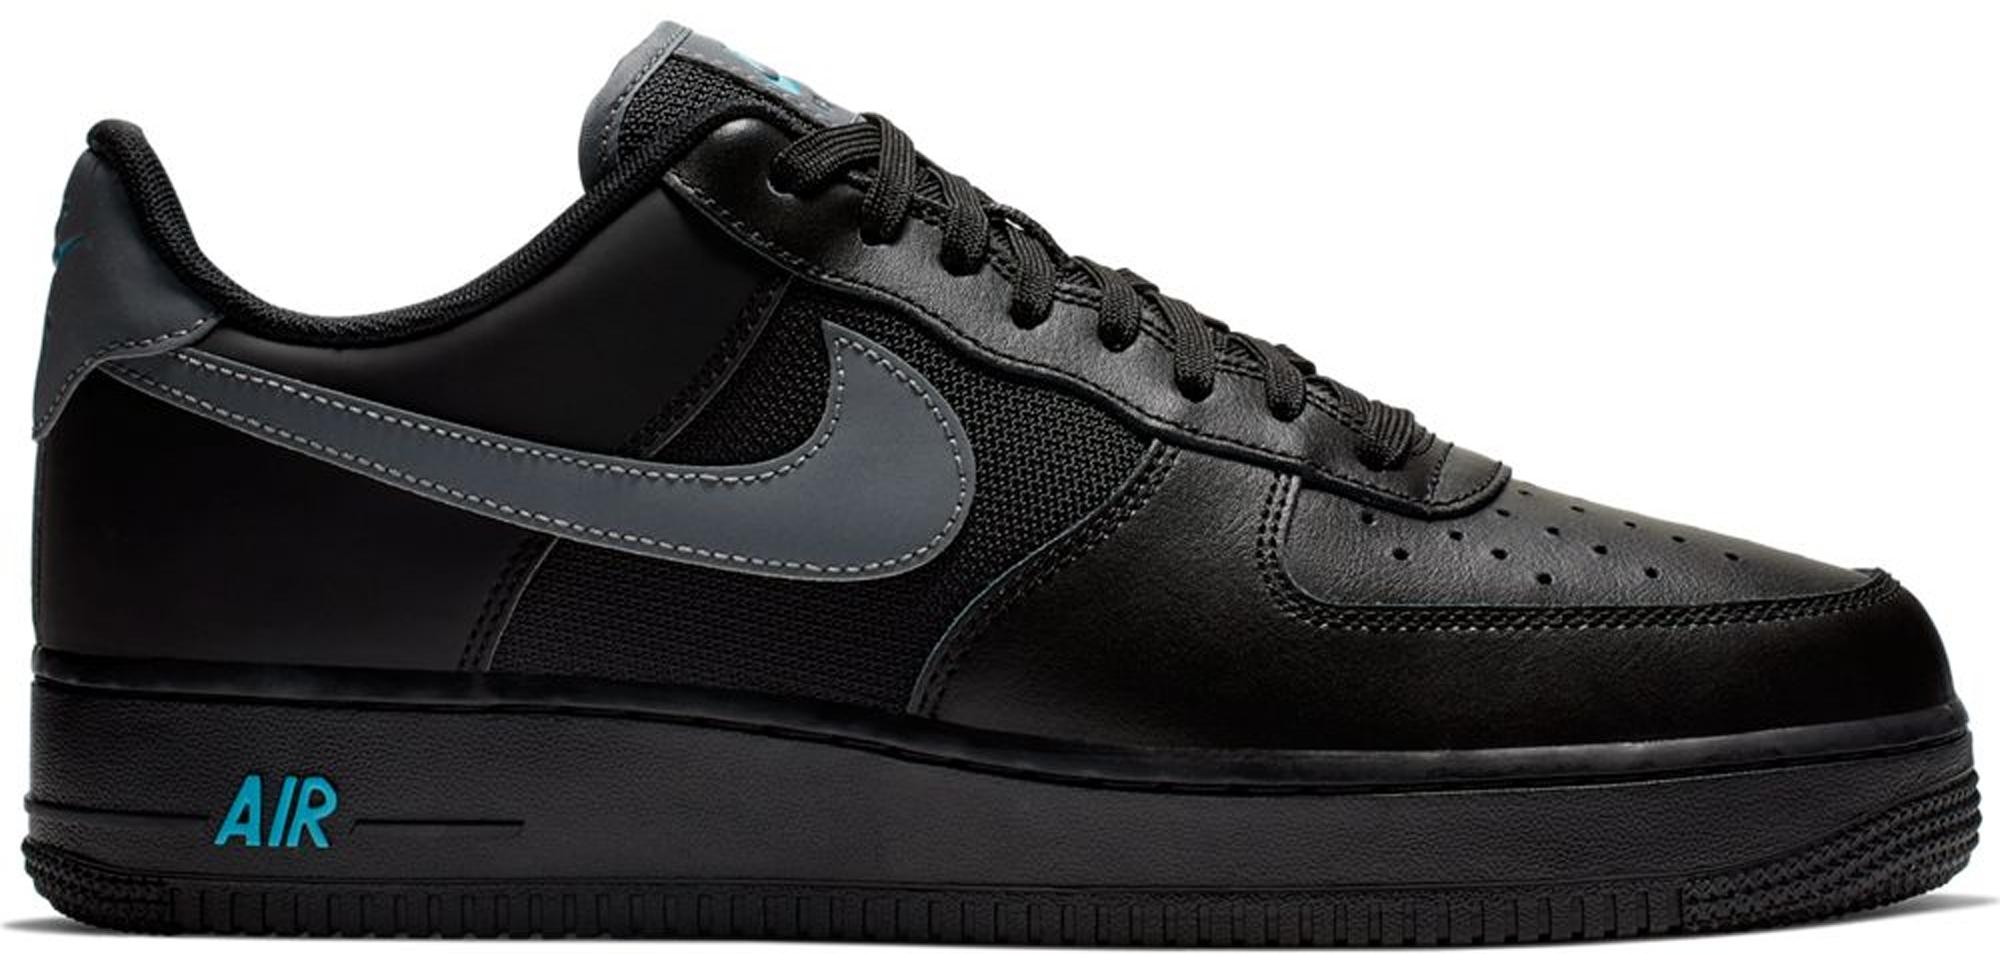 Nike Air Force 1 Low Black Blue Fury